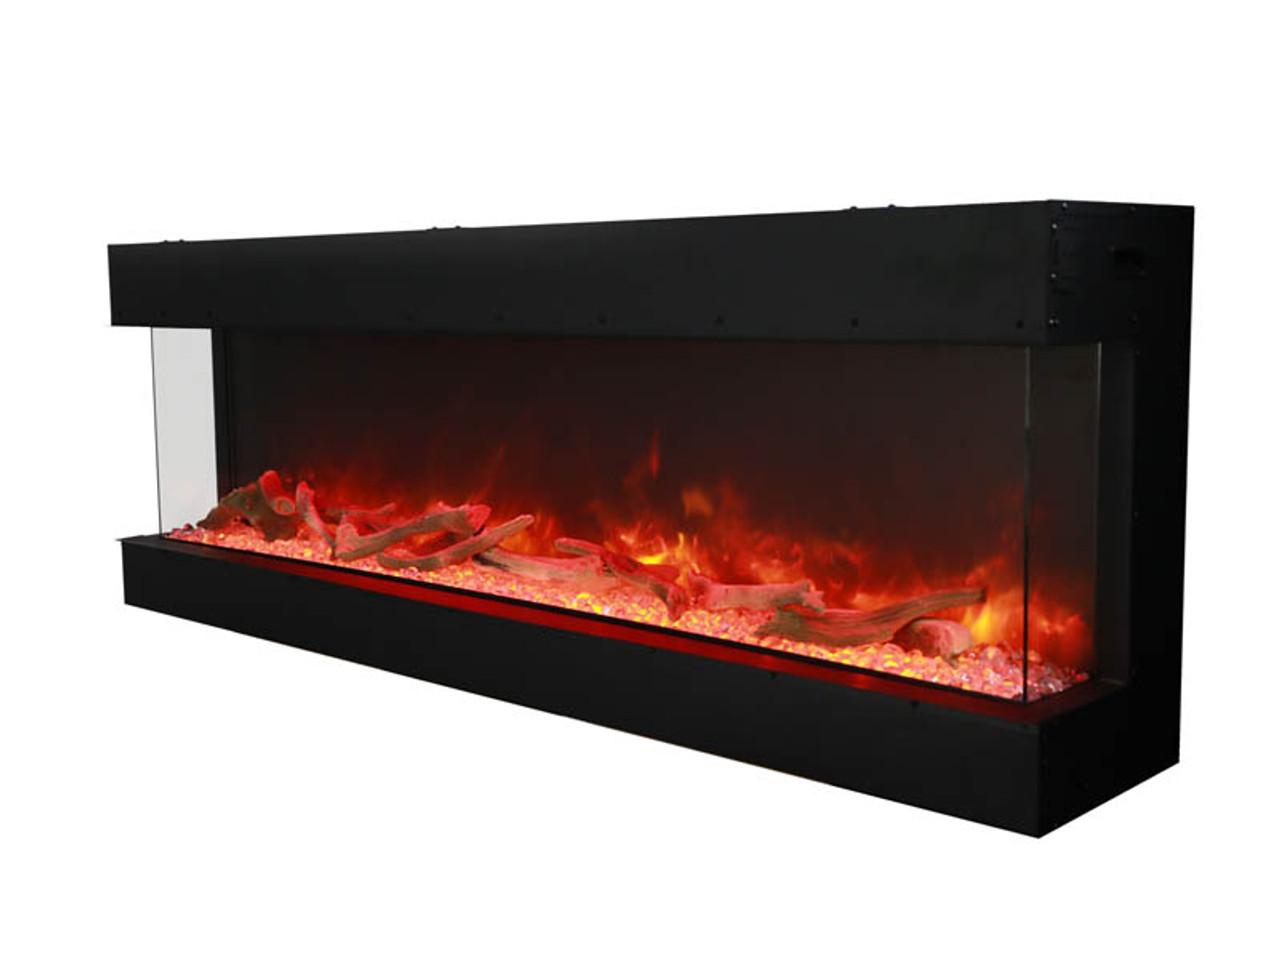 Amantii 72-TRU-VIEW-XL – 3 sided 72 inch Wide Electric Fireplace